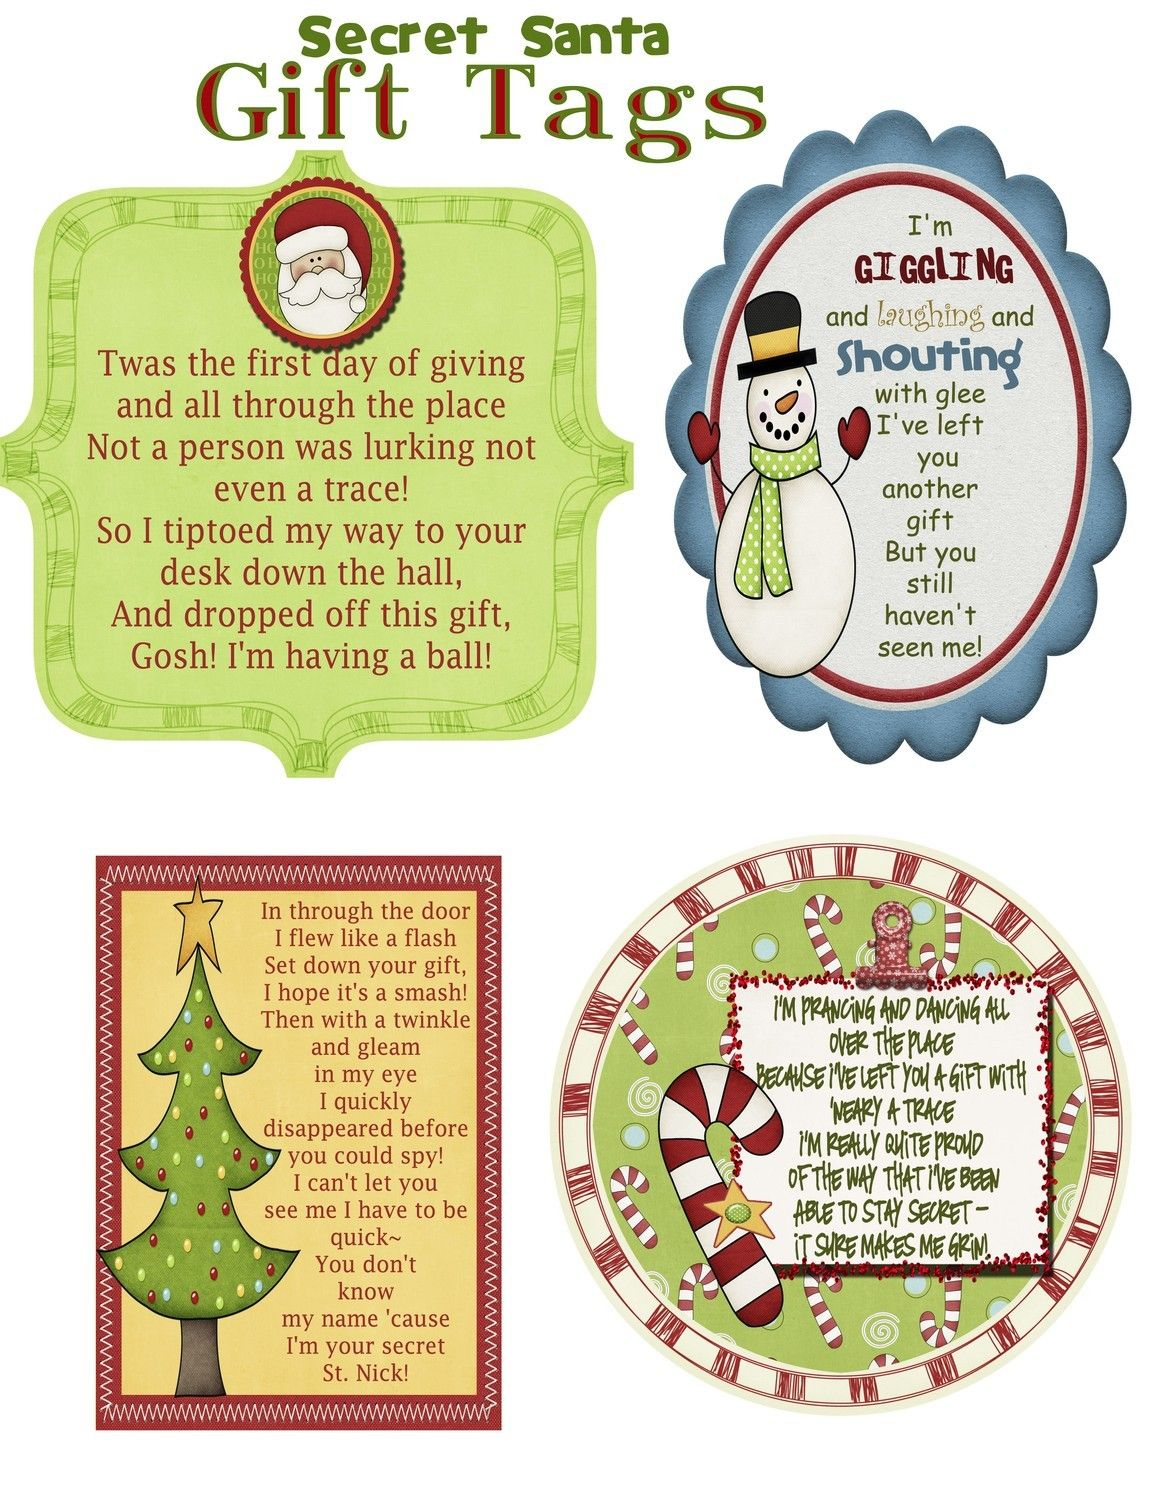 Secret Santa Gift Tag Poem By Kate On Etsy